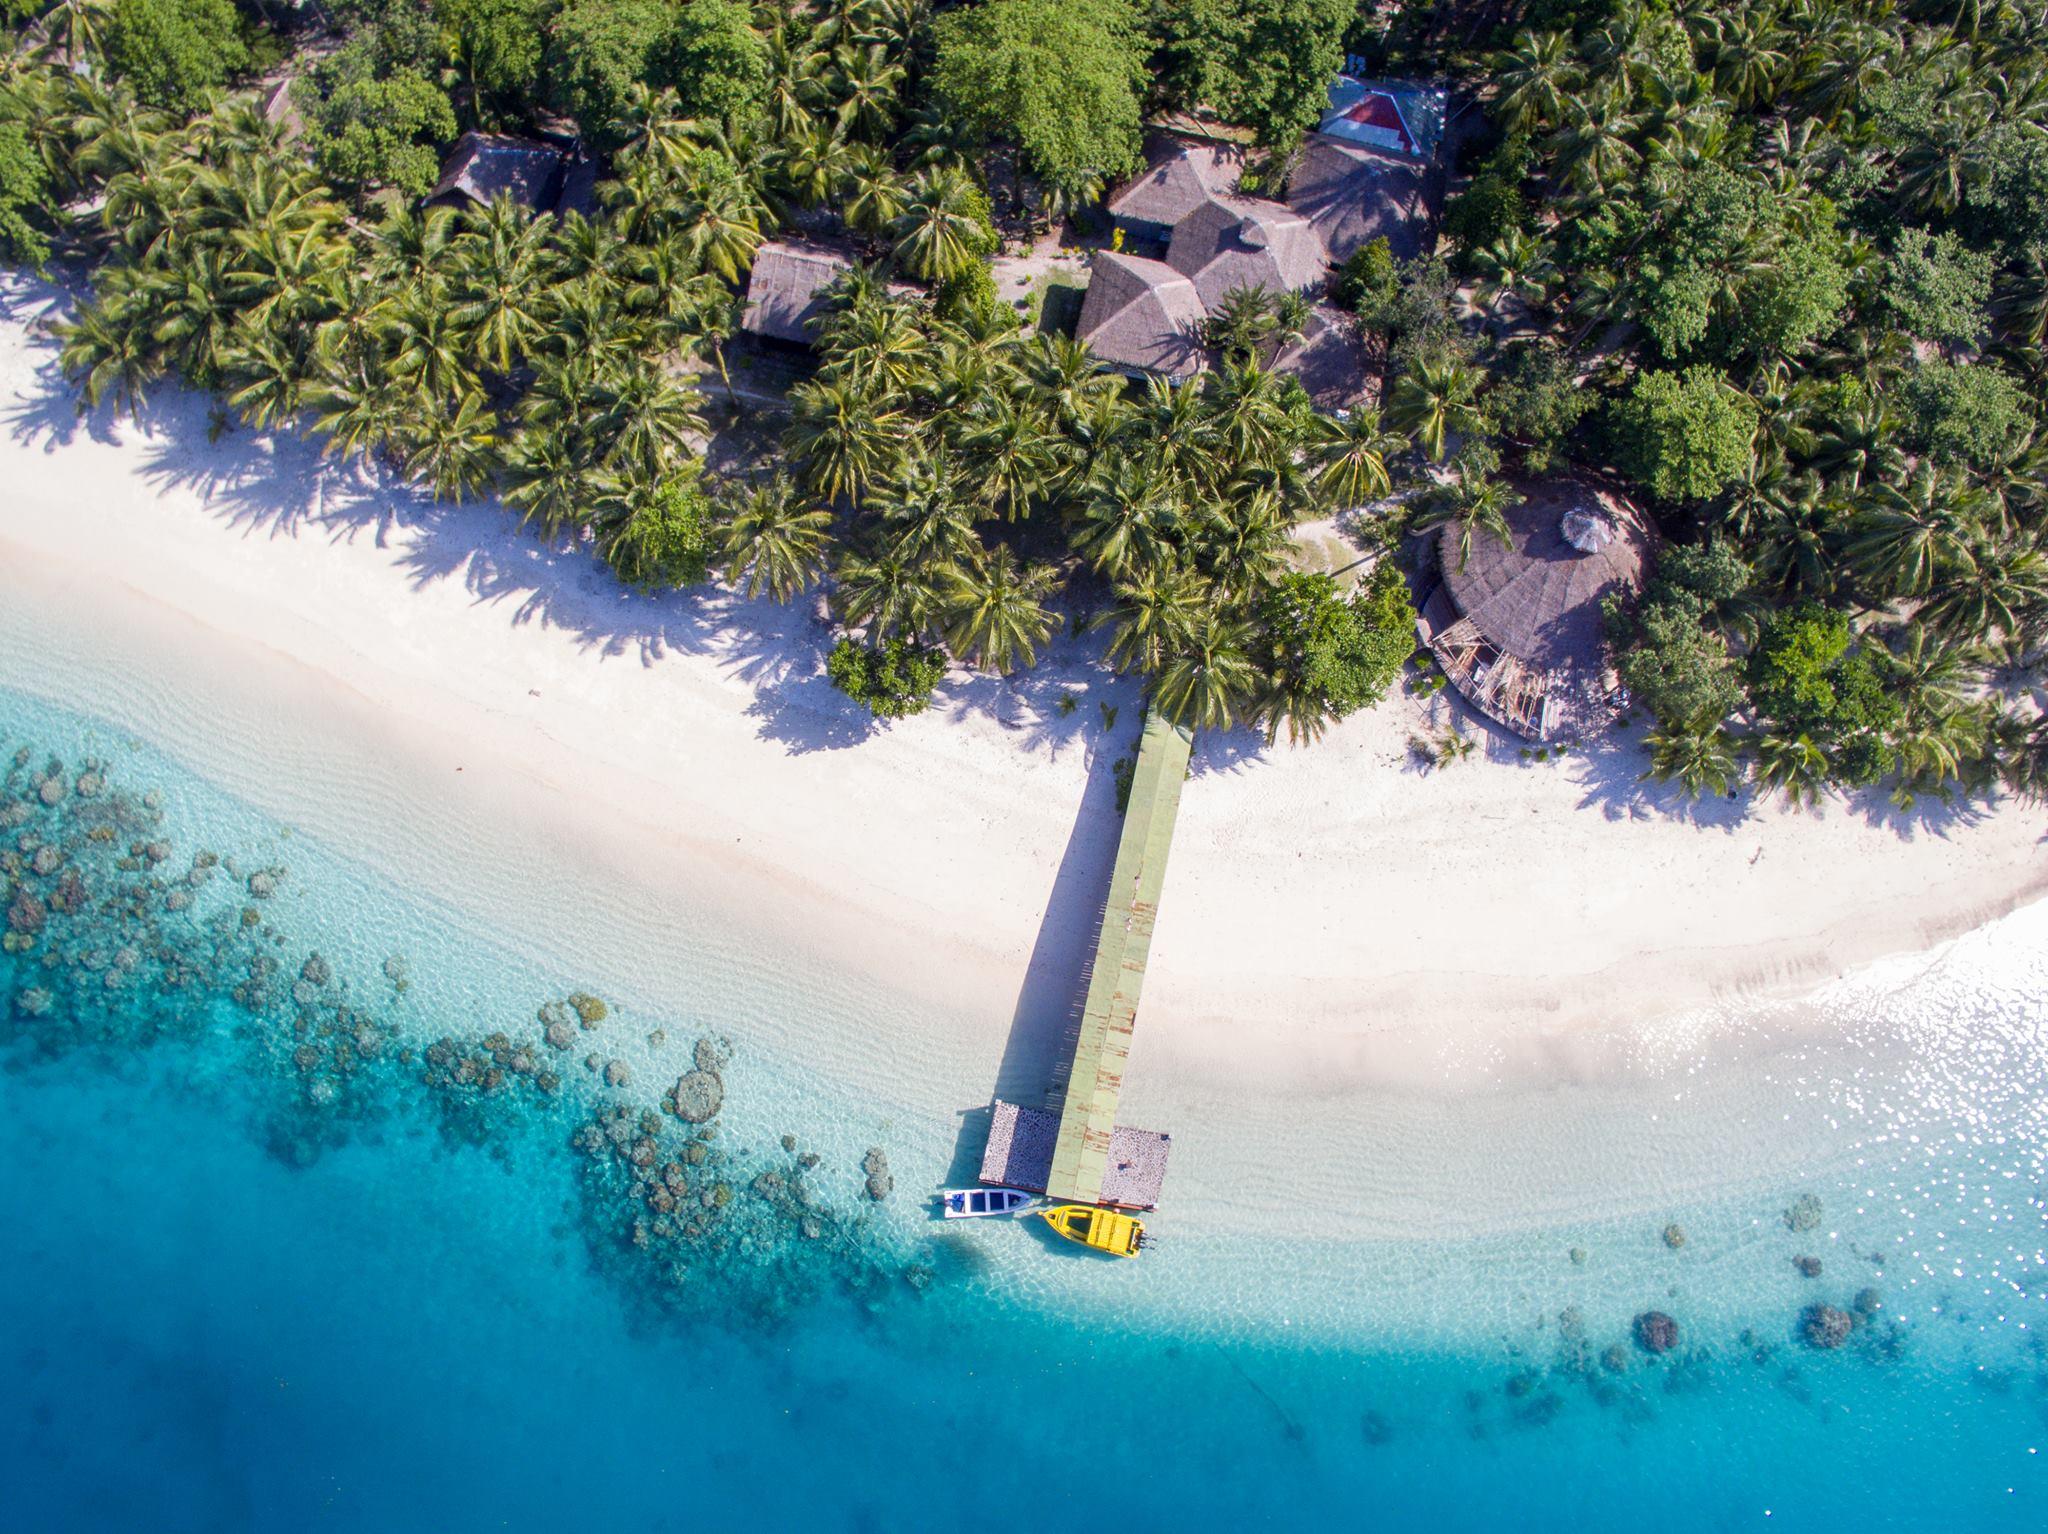 Mentawai island by drone